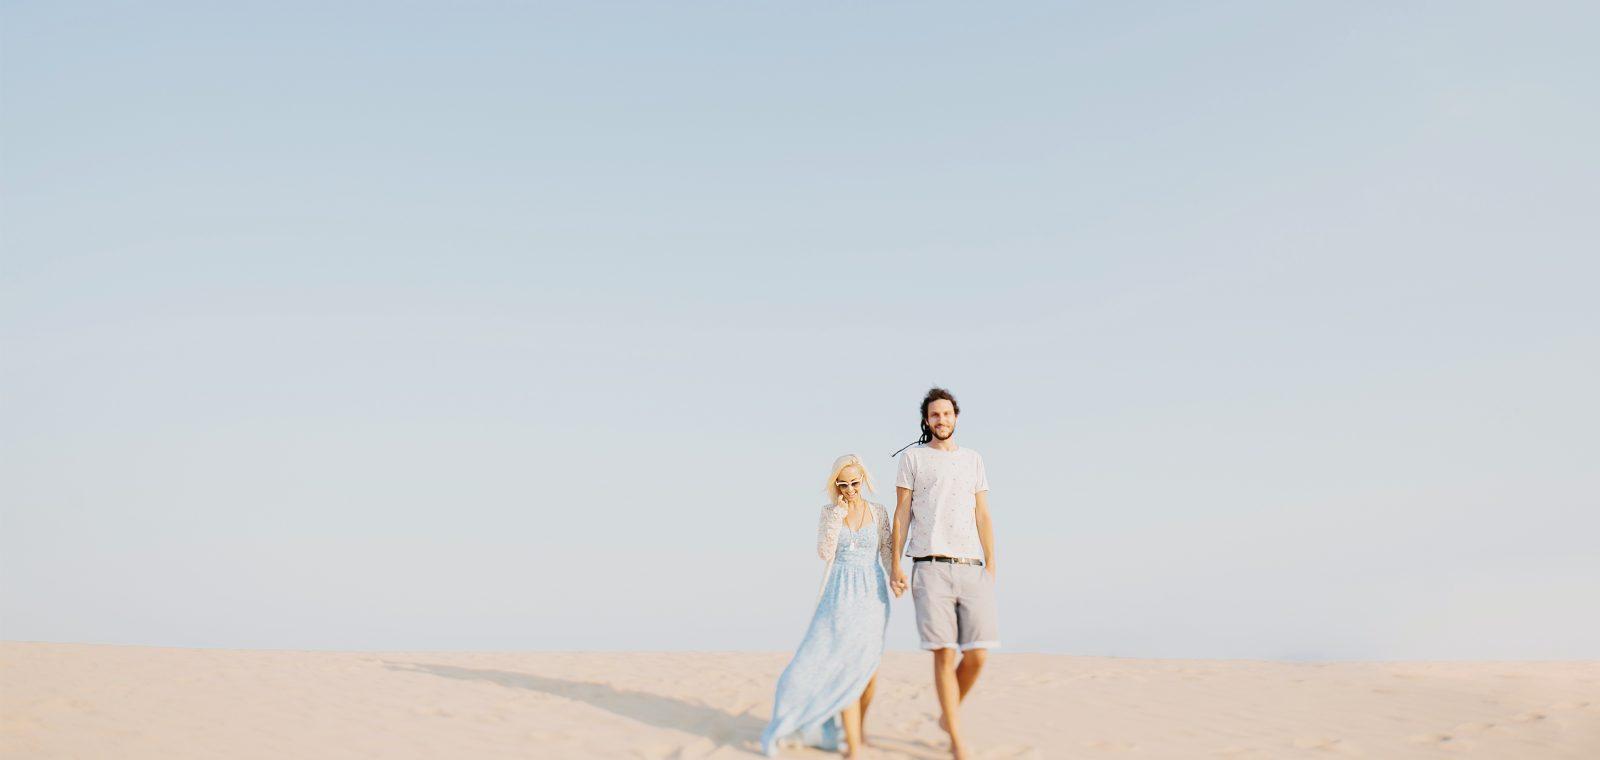 Alex + Sara, Engaged